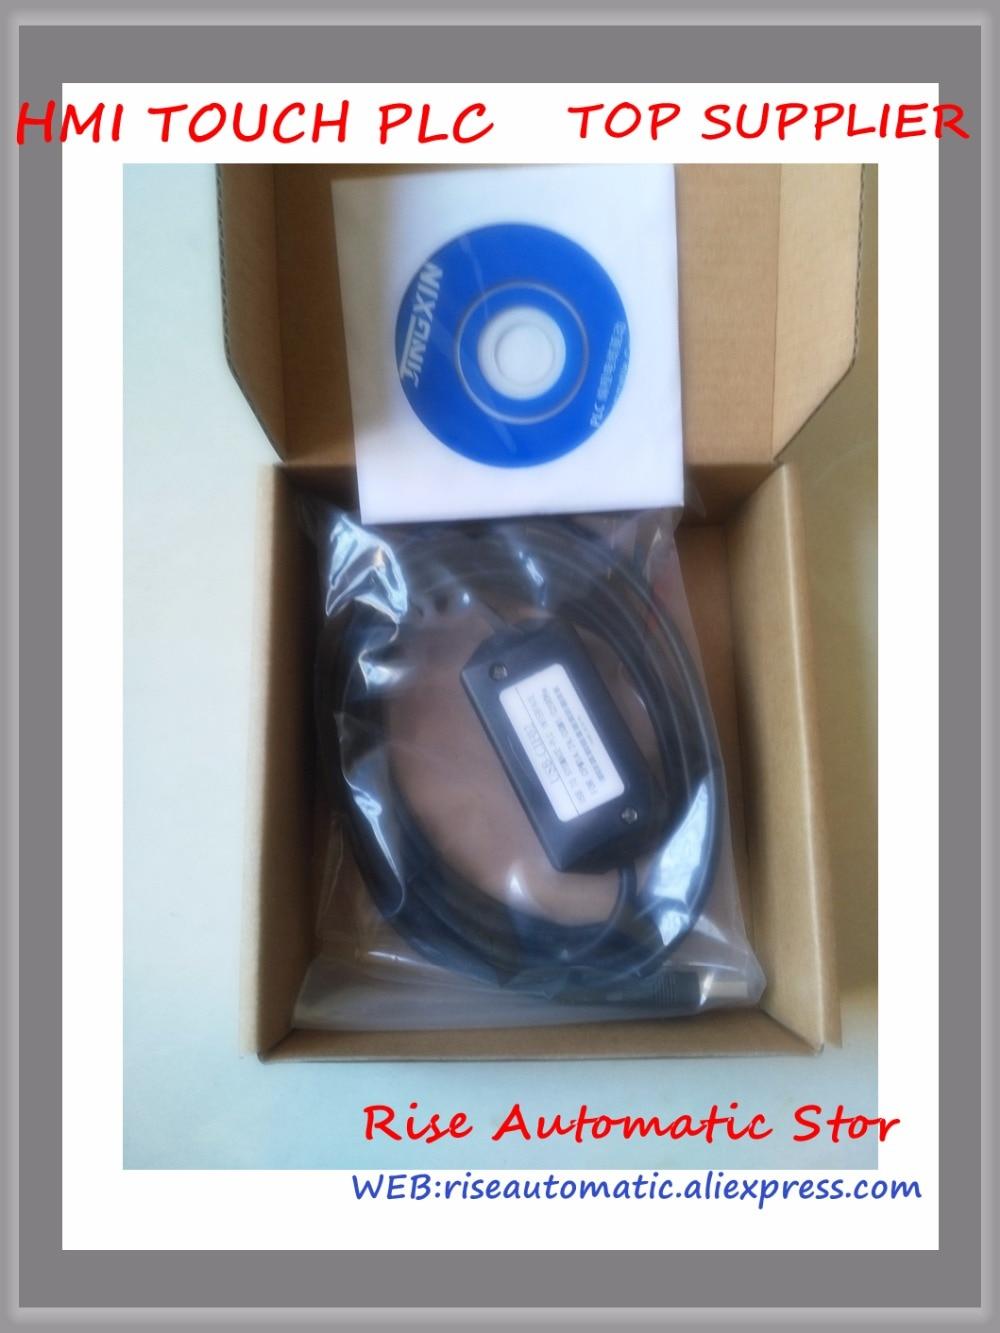 USB-CIF02 PLC Cable USBCIF02 for CPM1/CPM1A/2A/CQM1/C200HS/C200HX/HG/HE and SRM1 PLC USB CIF02 USB/CIF02 Support Win7/Win8 brand factory seal cpm1a 20cdt d v1 plc